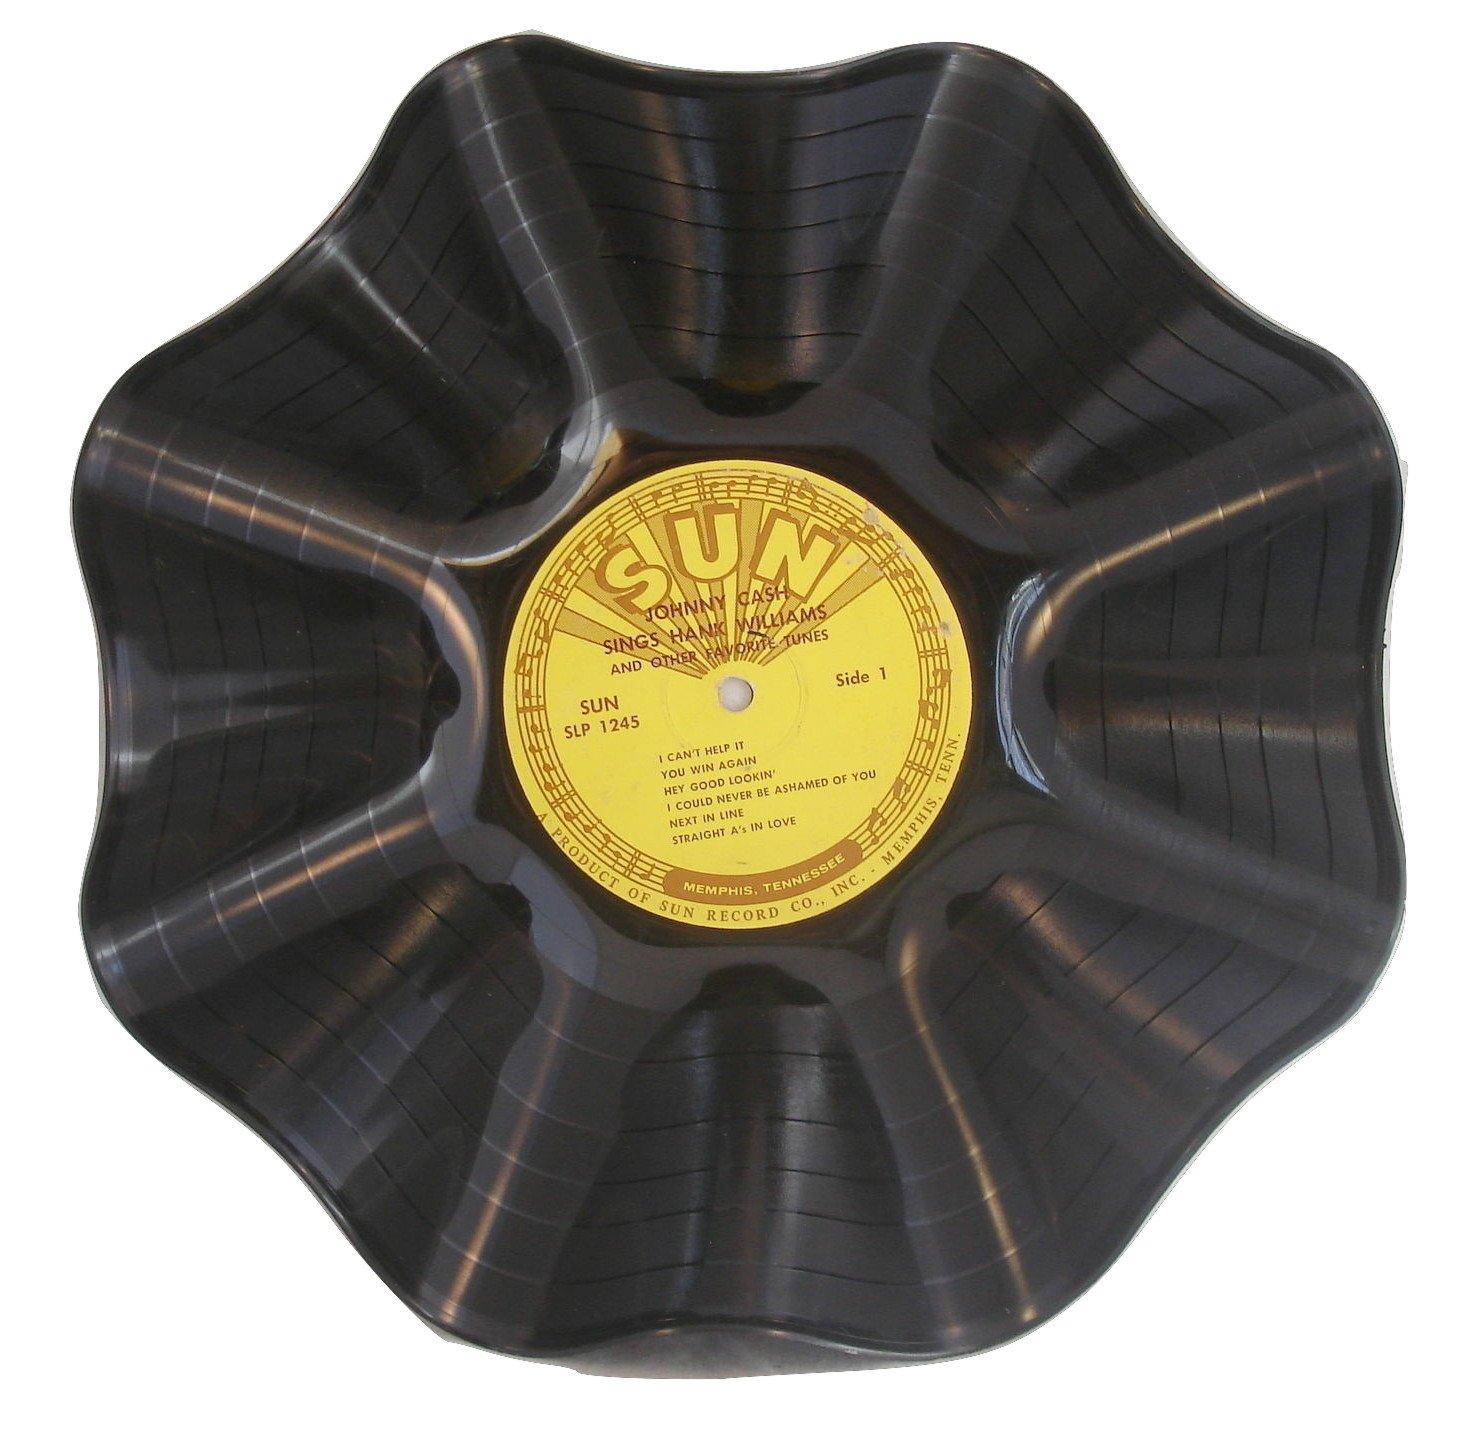 Vinyl Record Bowl hand made using a Johnny Cash vinyl record album